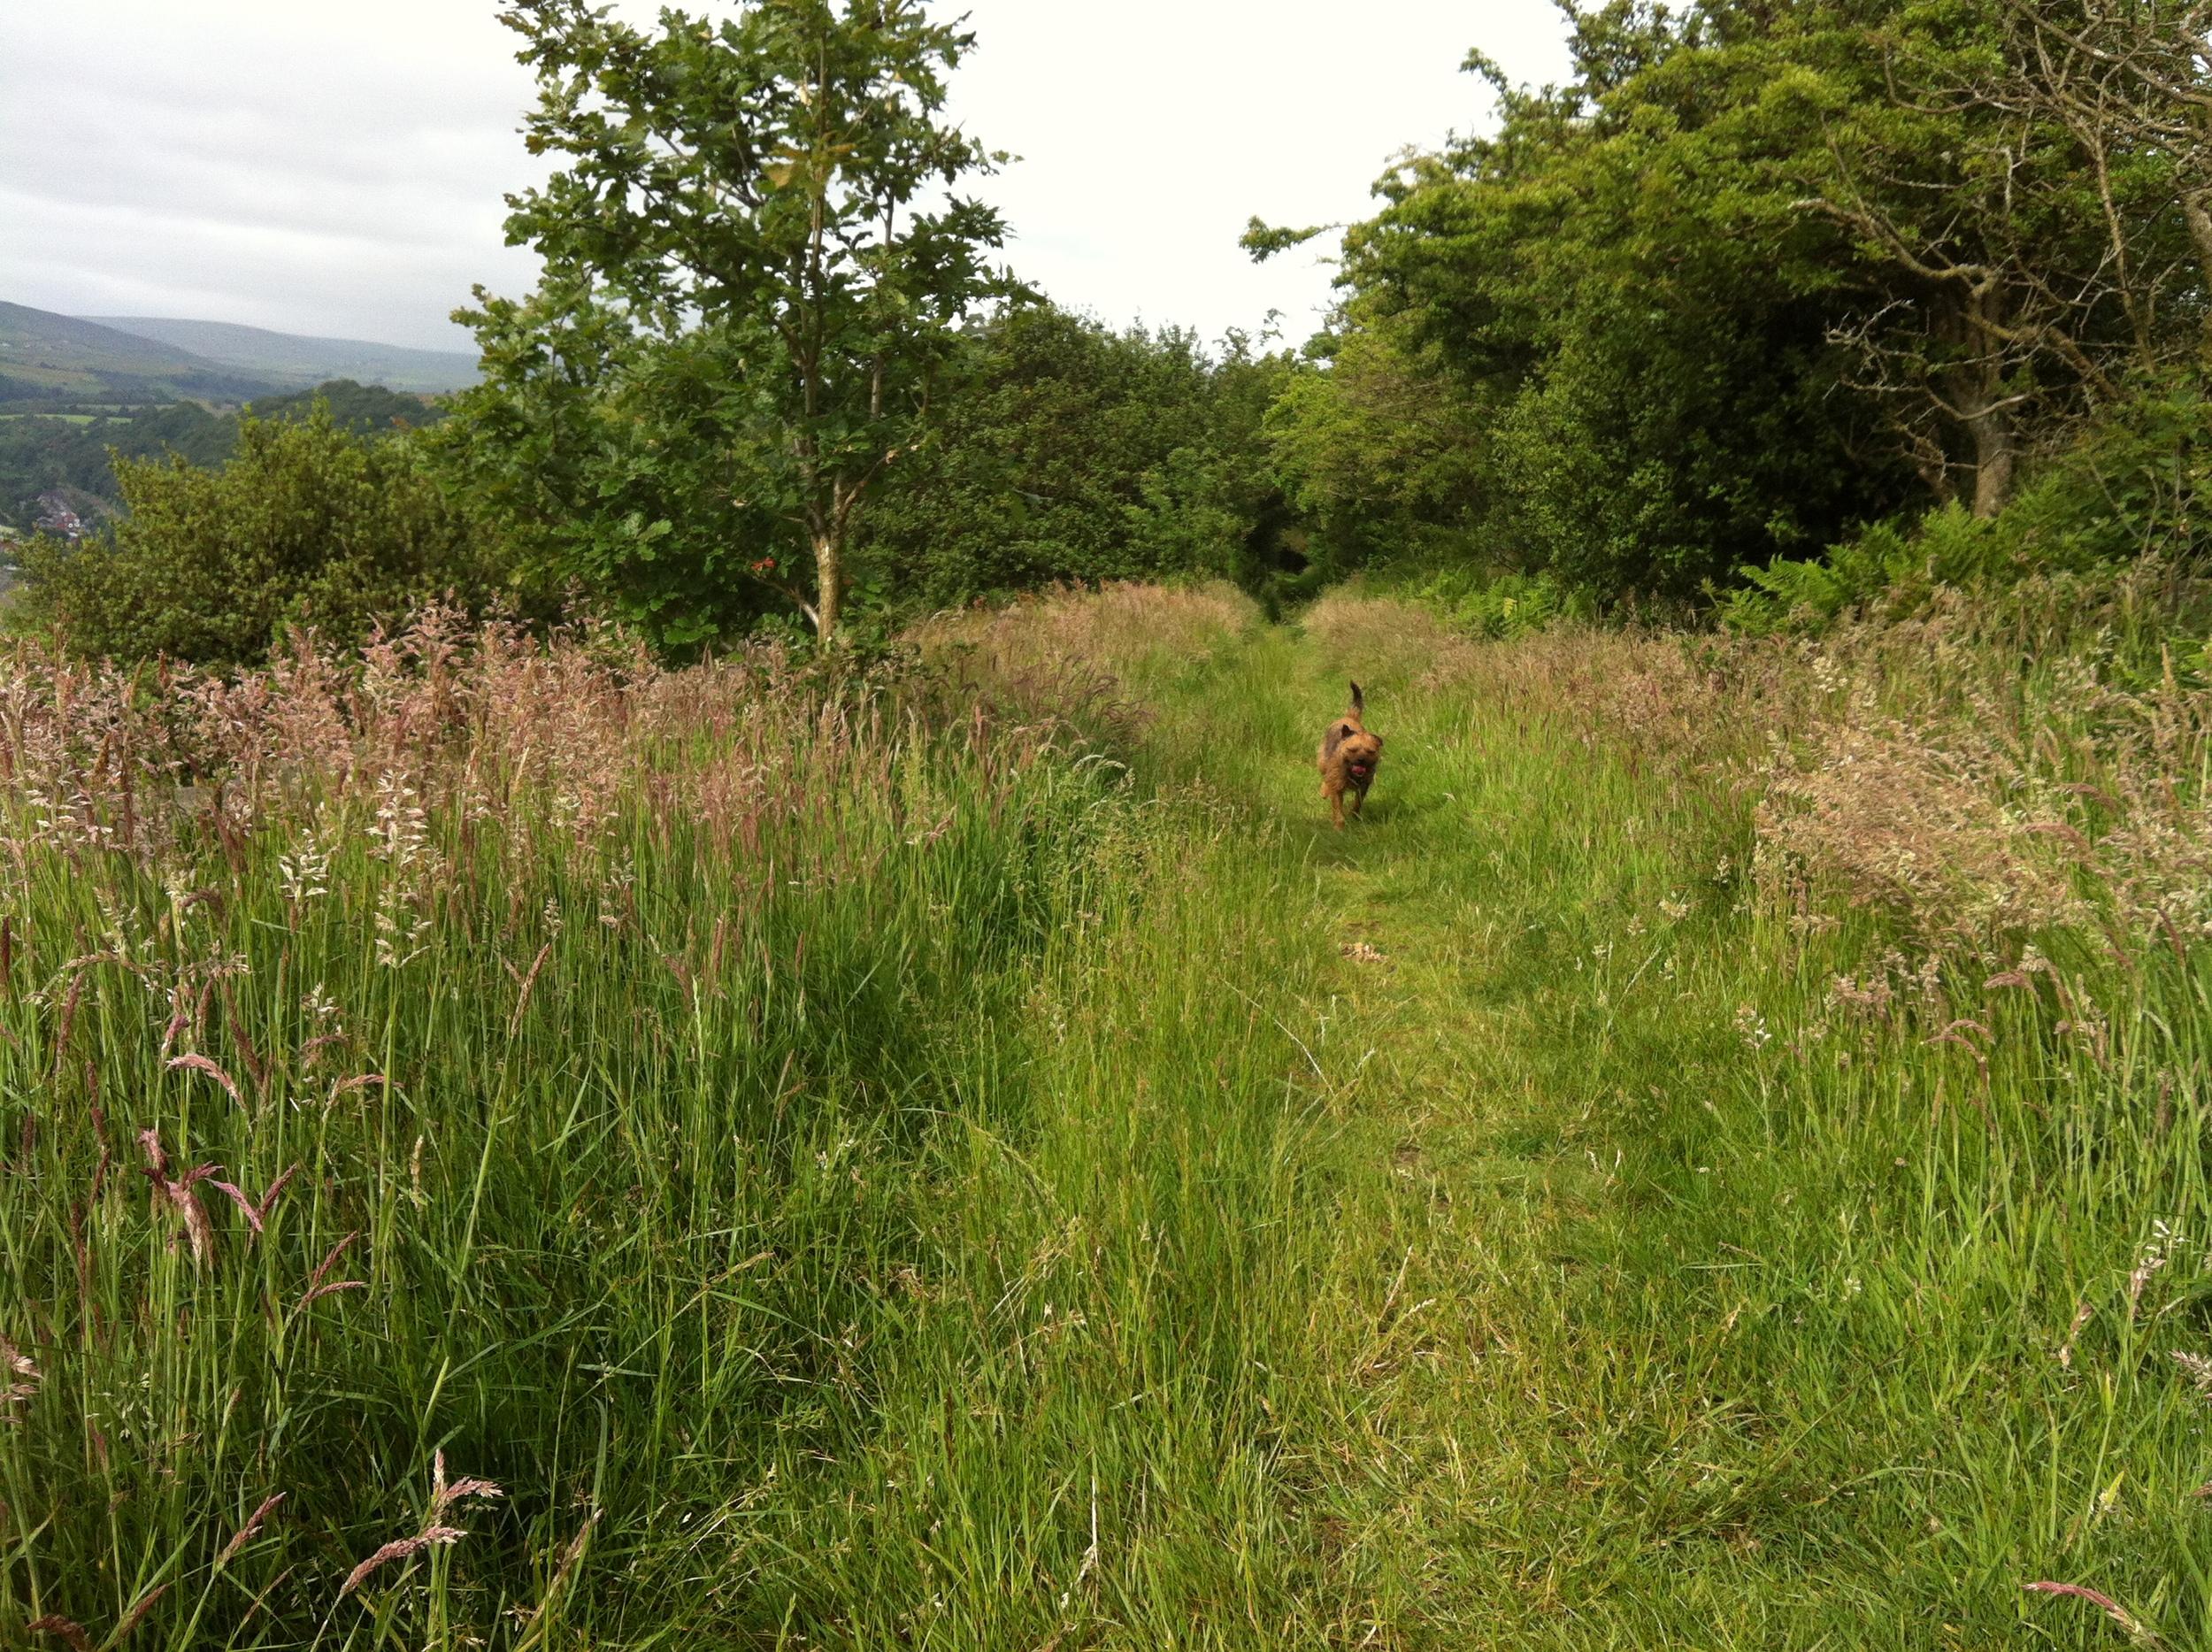 Tess on summer walk